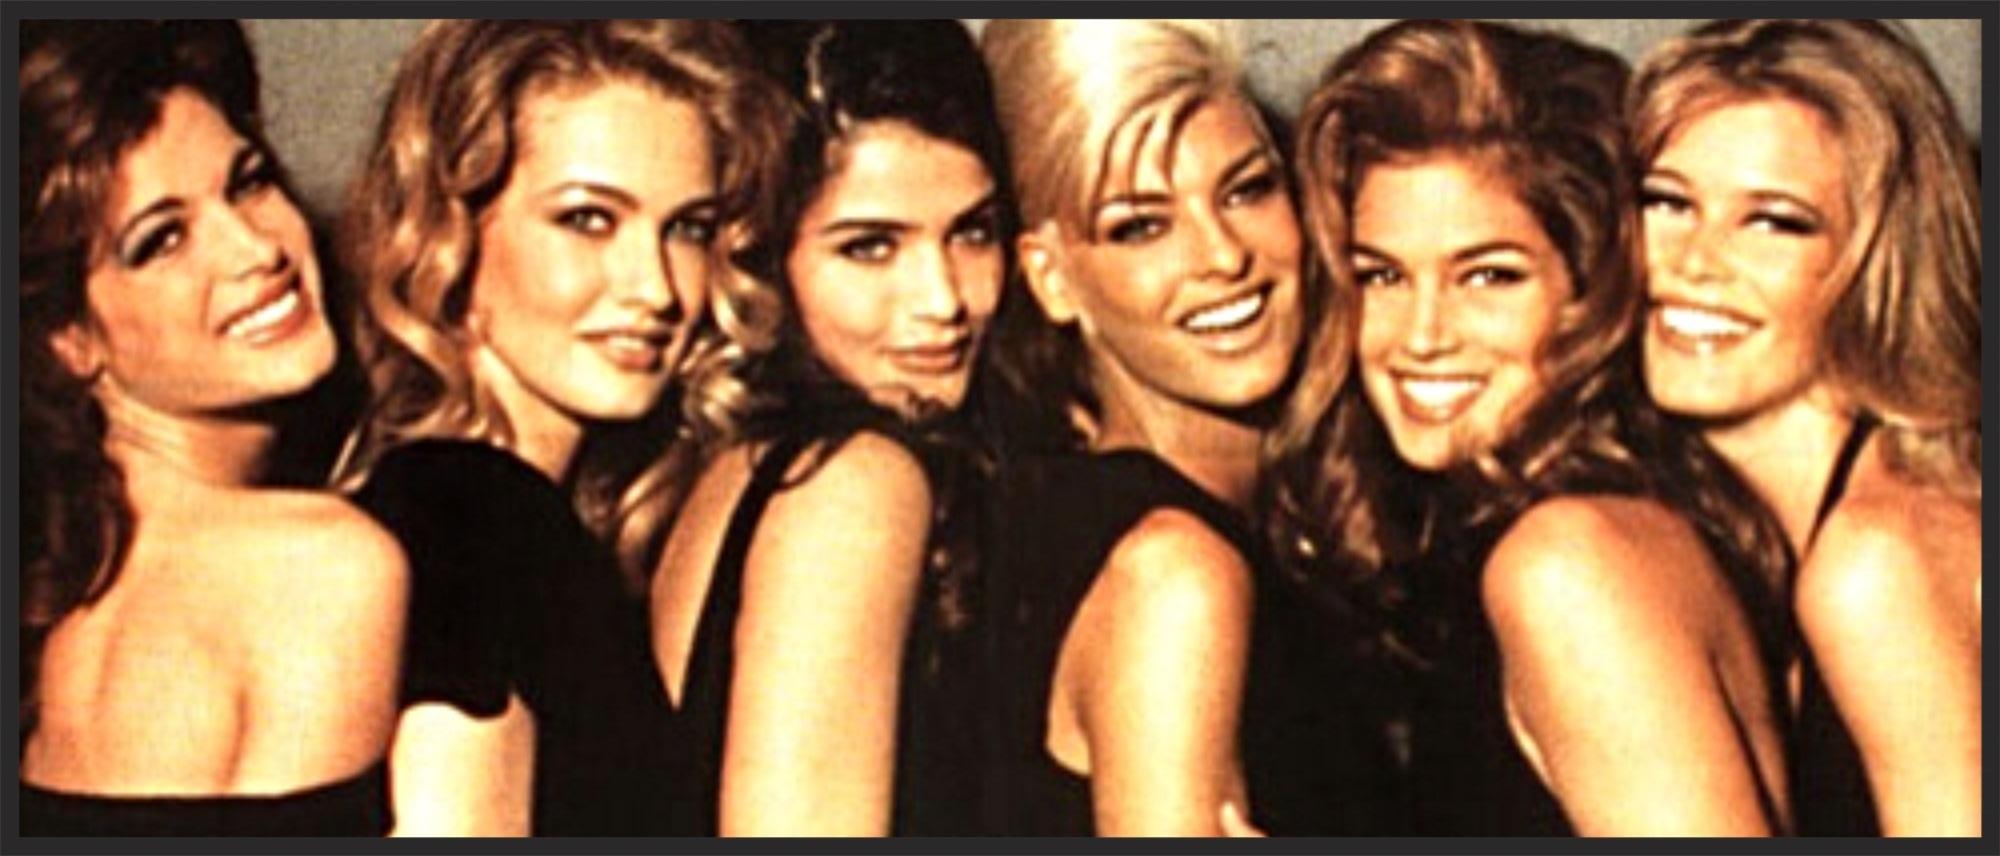 Модели 90 х годов фото